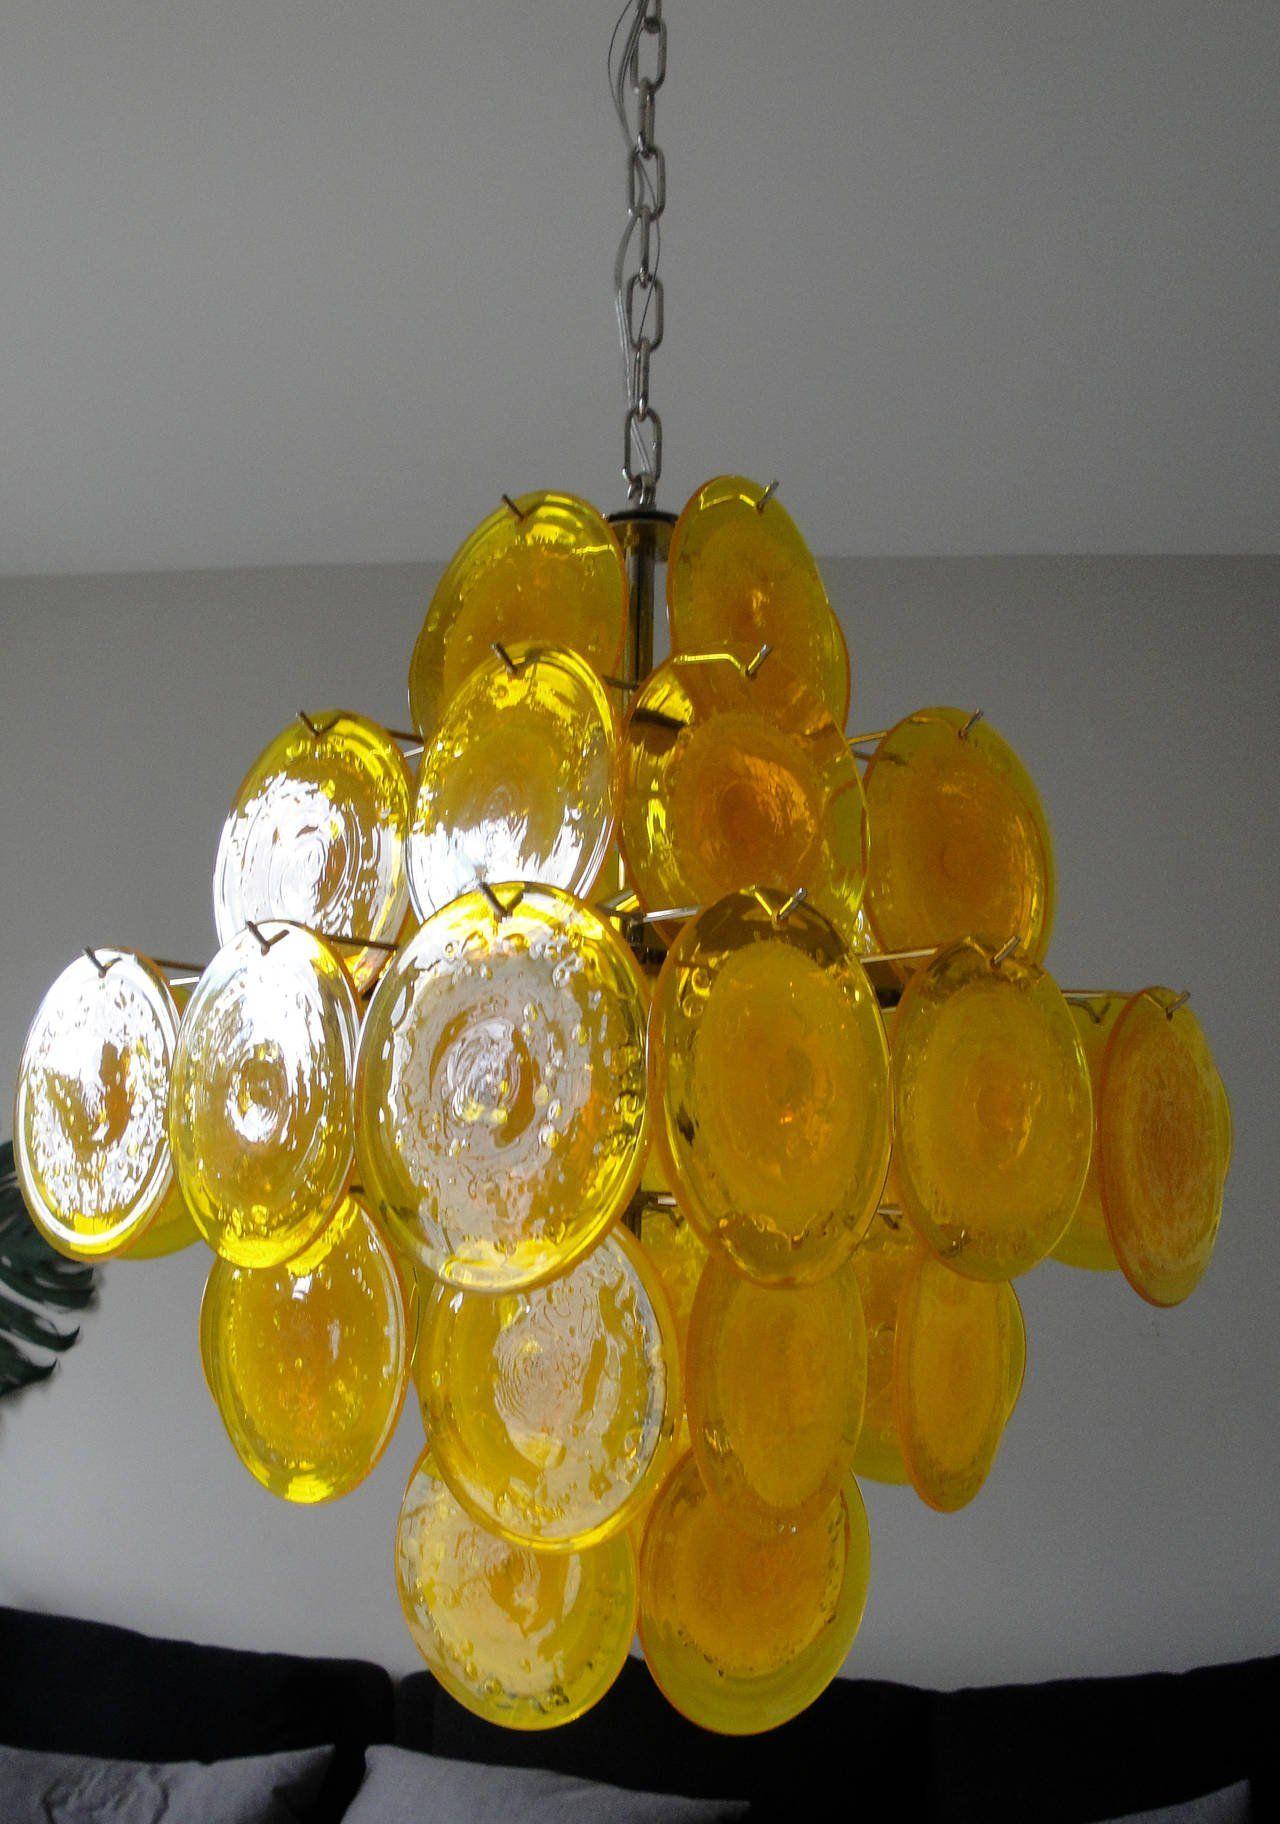 yellow Murano Glass Chandeliers | Arte decorativo 1 - Art Decorative ...